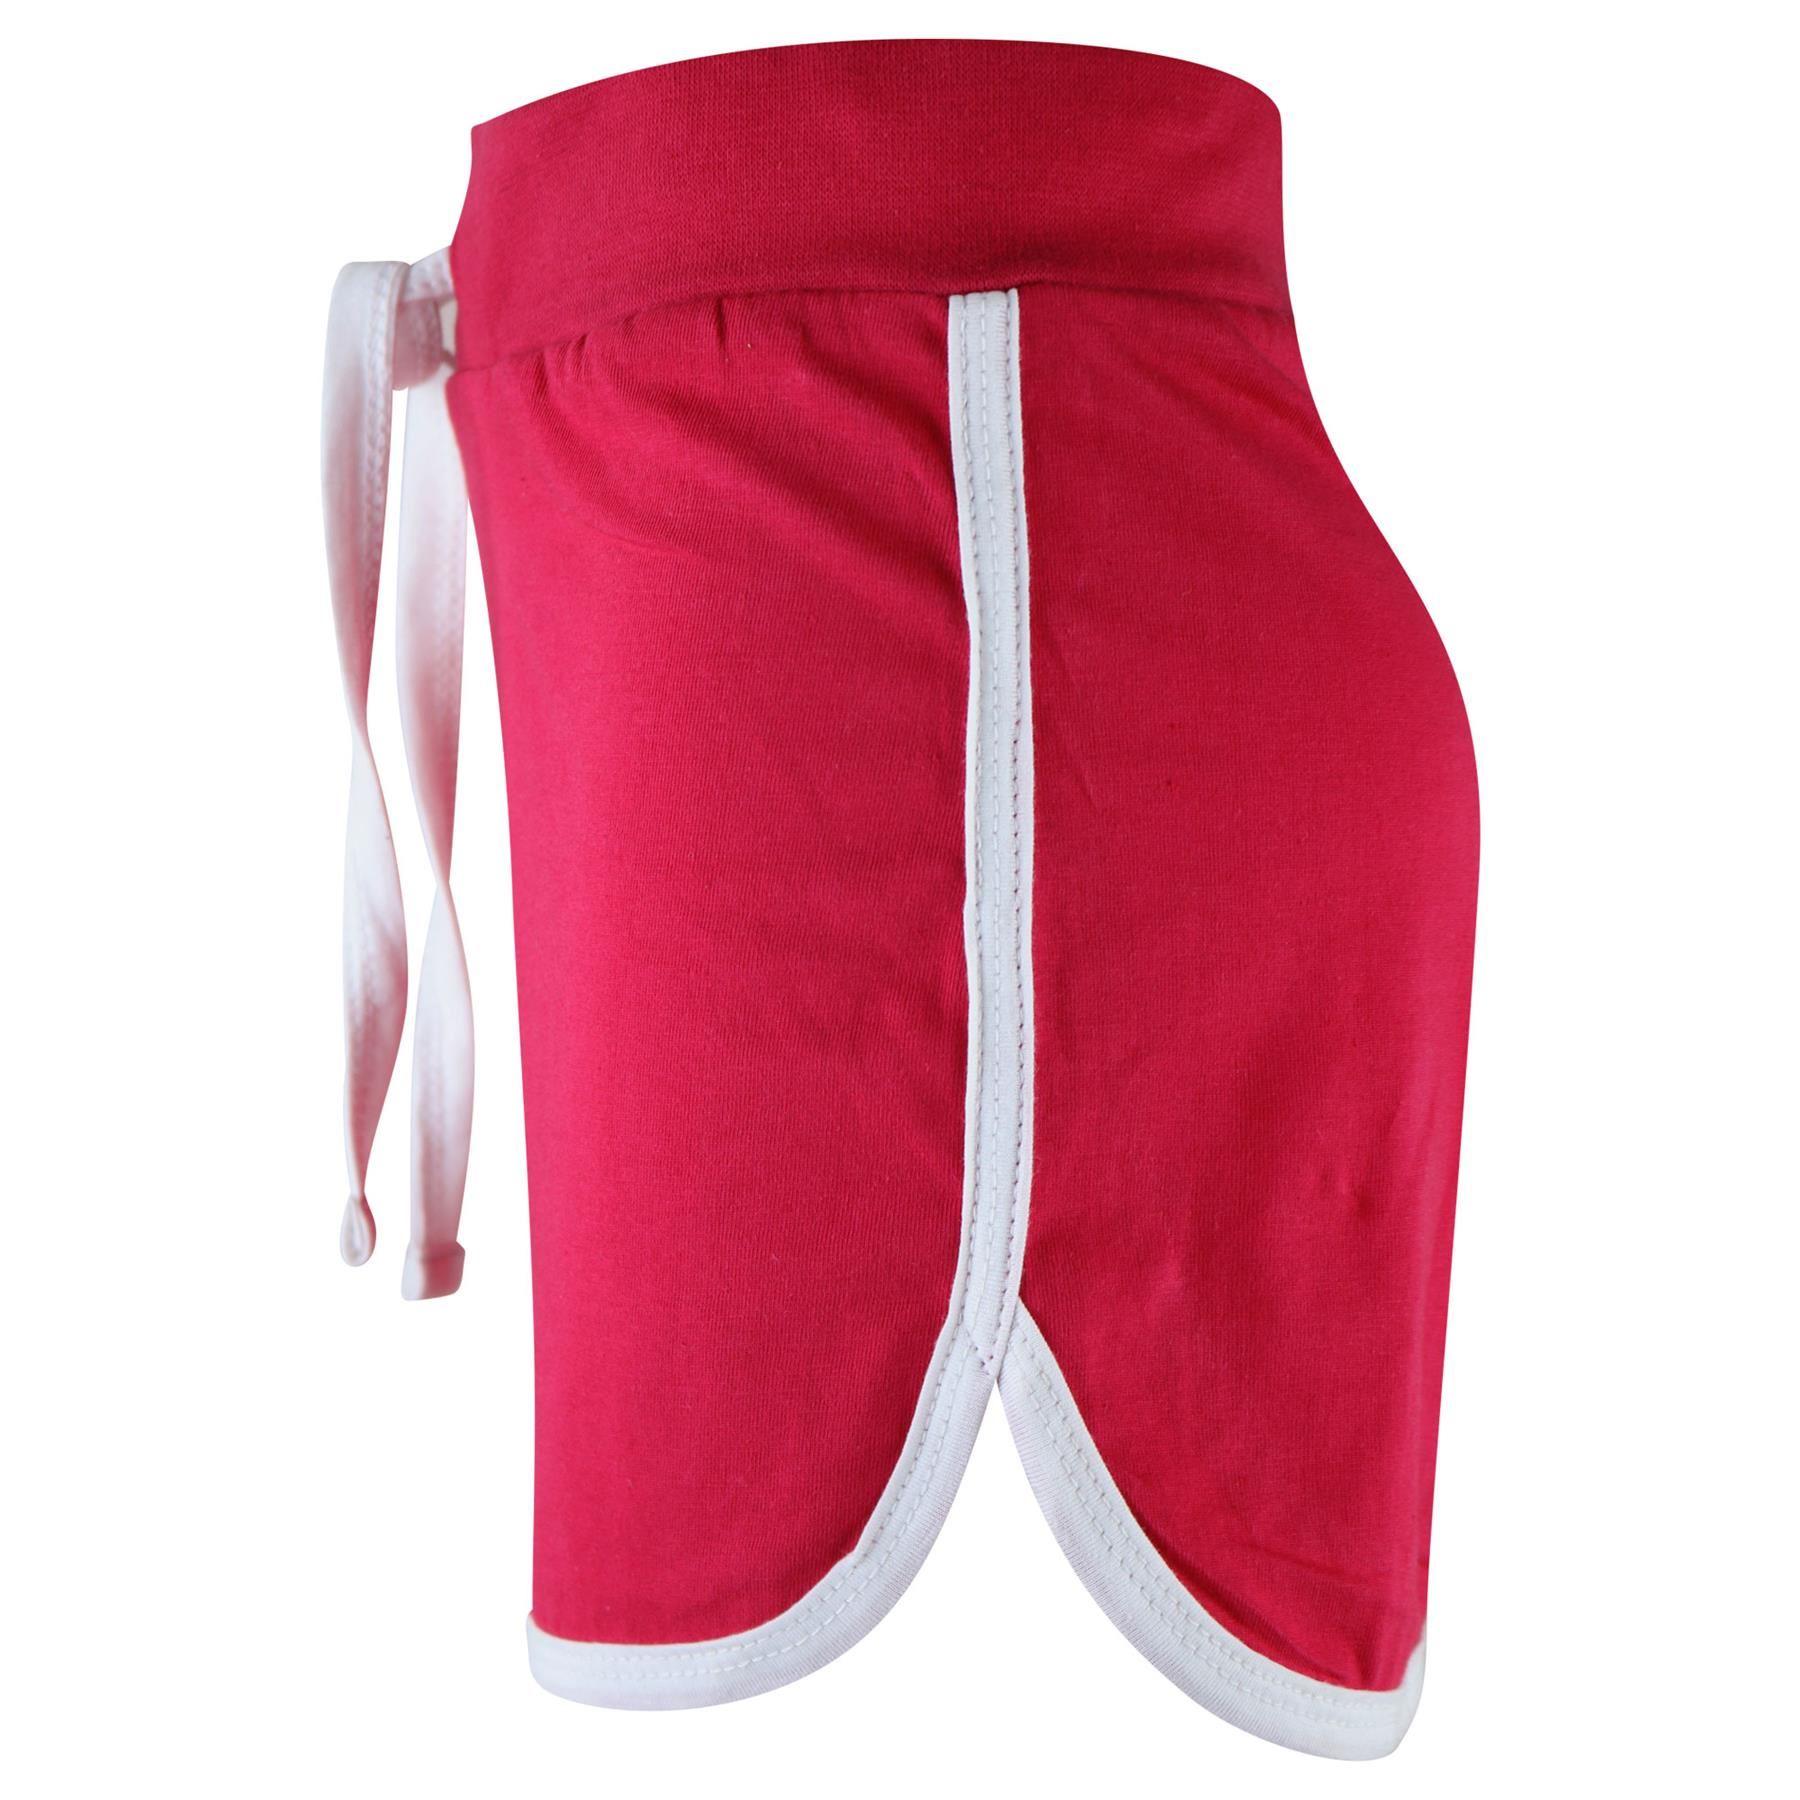 Kids-Girls-Shorts-100-Cotton-Dance-Gym-Sports-Summer-Hot-Short-Pants-2-13-Years Indexbild 25